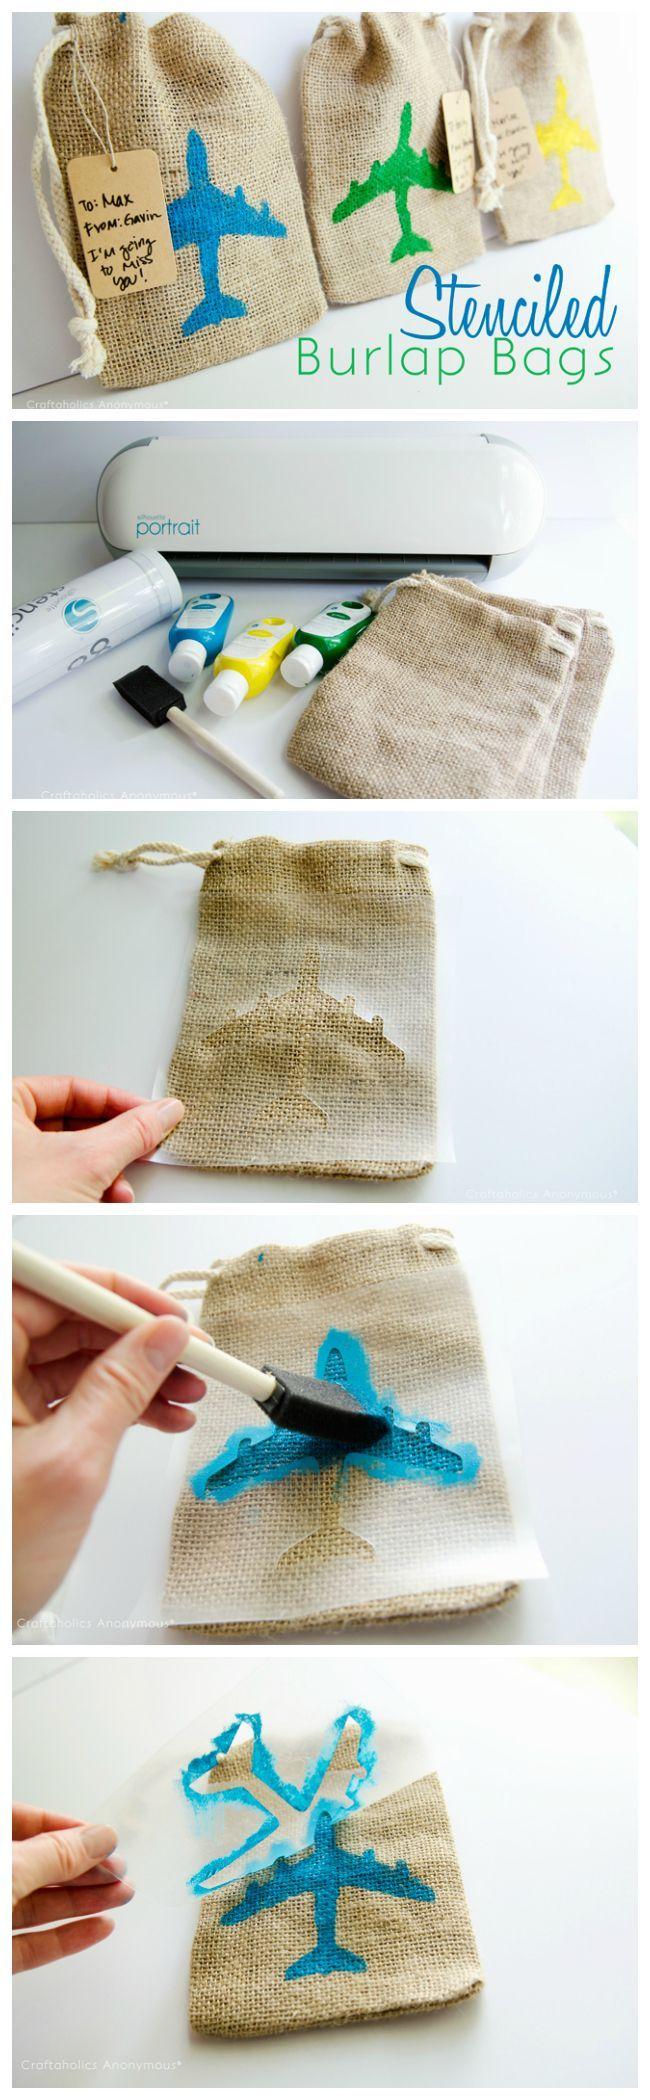 DIY stenciled burlap bags made with the Silhouette ❥ 4U hilariafina  http://www.pinterest.com/hilariafina/